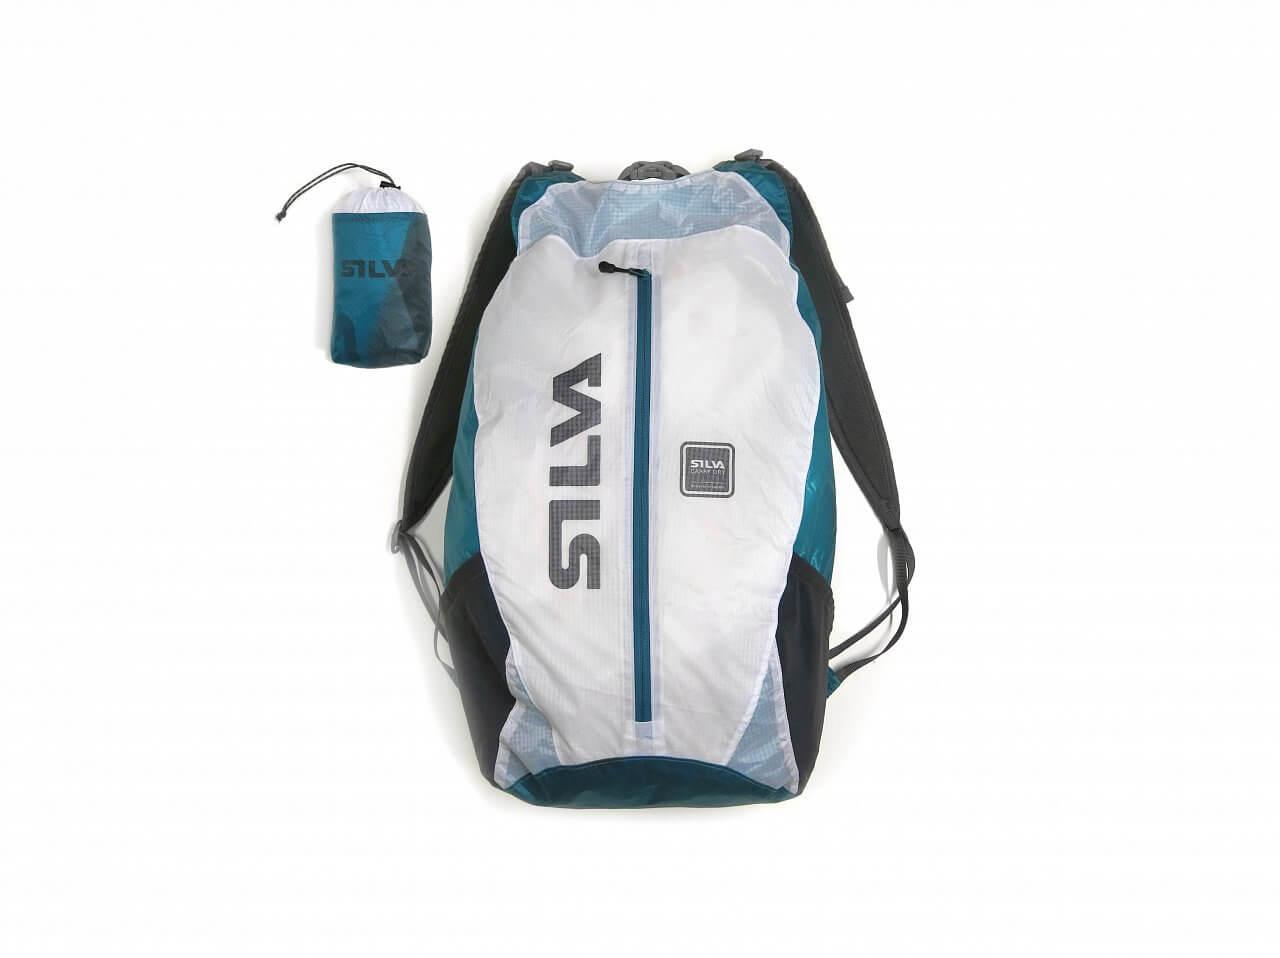 Tašky a batohy Silva Batoh Carry Dry 23 L Default